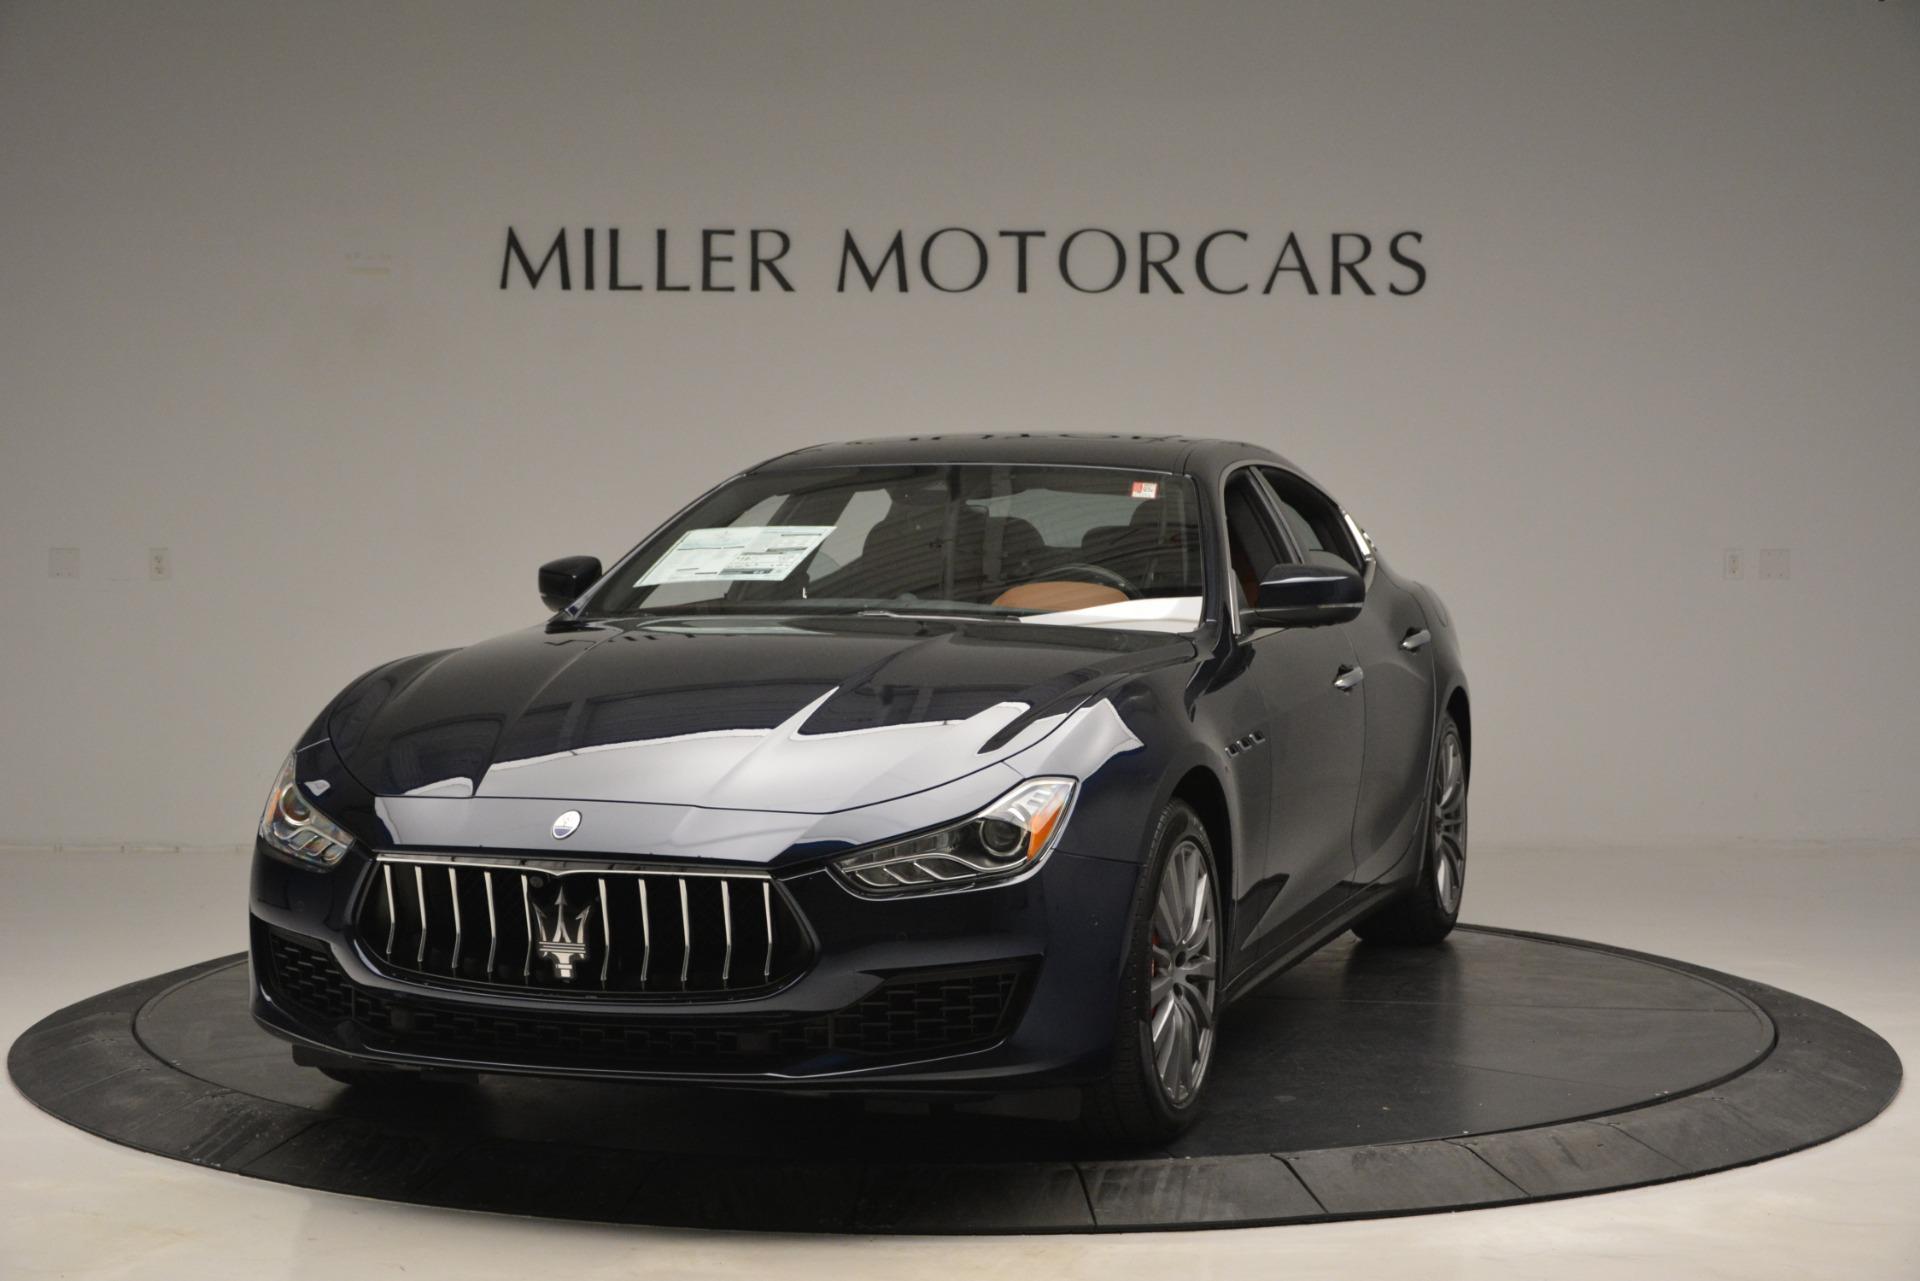 New 2019 Maserati Ghibli S Q4 For Sale In Greenwich, CT. Alfa Romeo of Greenwich, M2243 2796_main